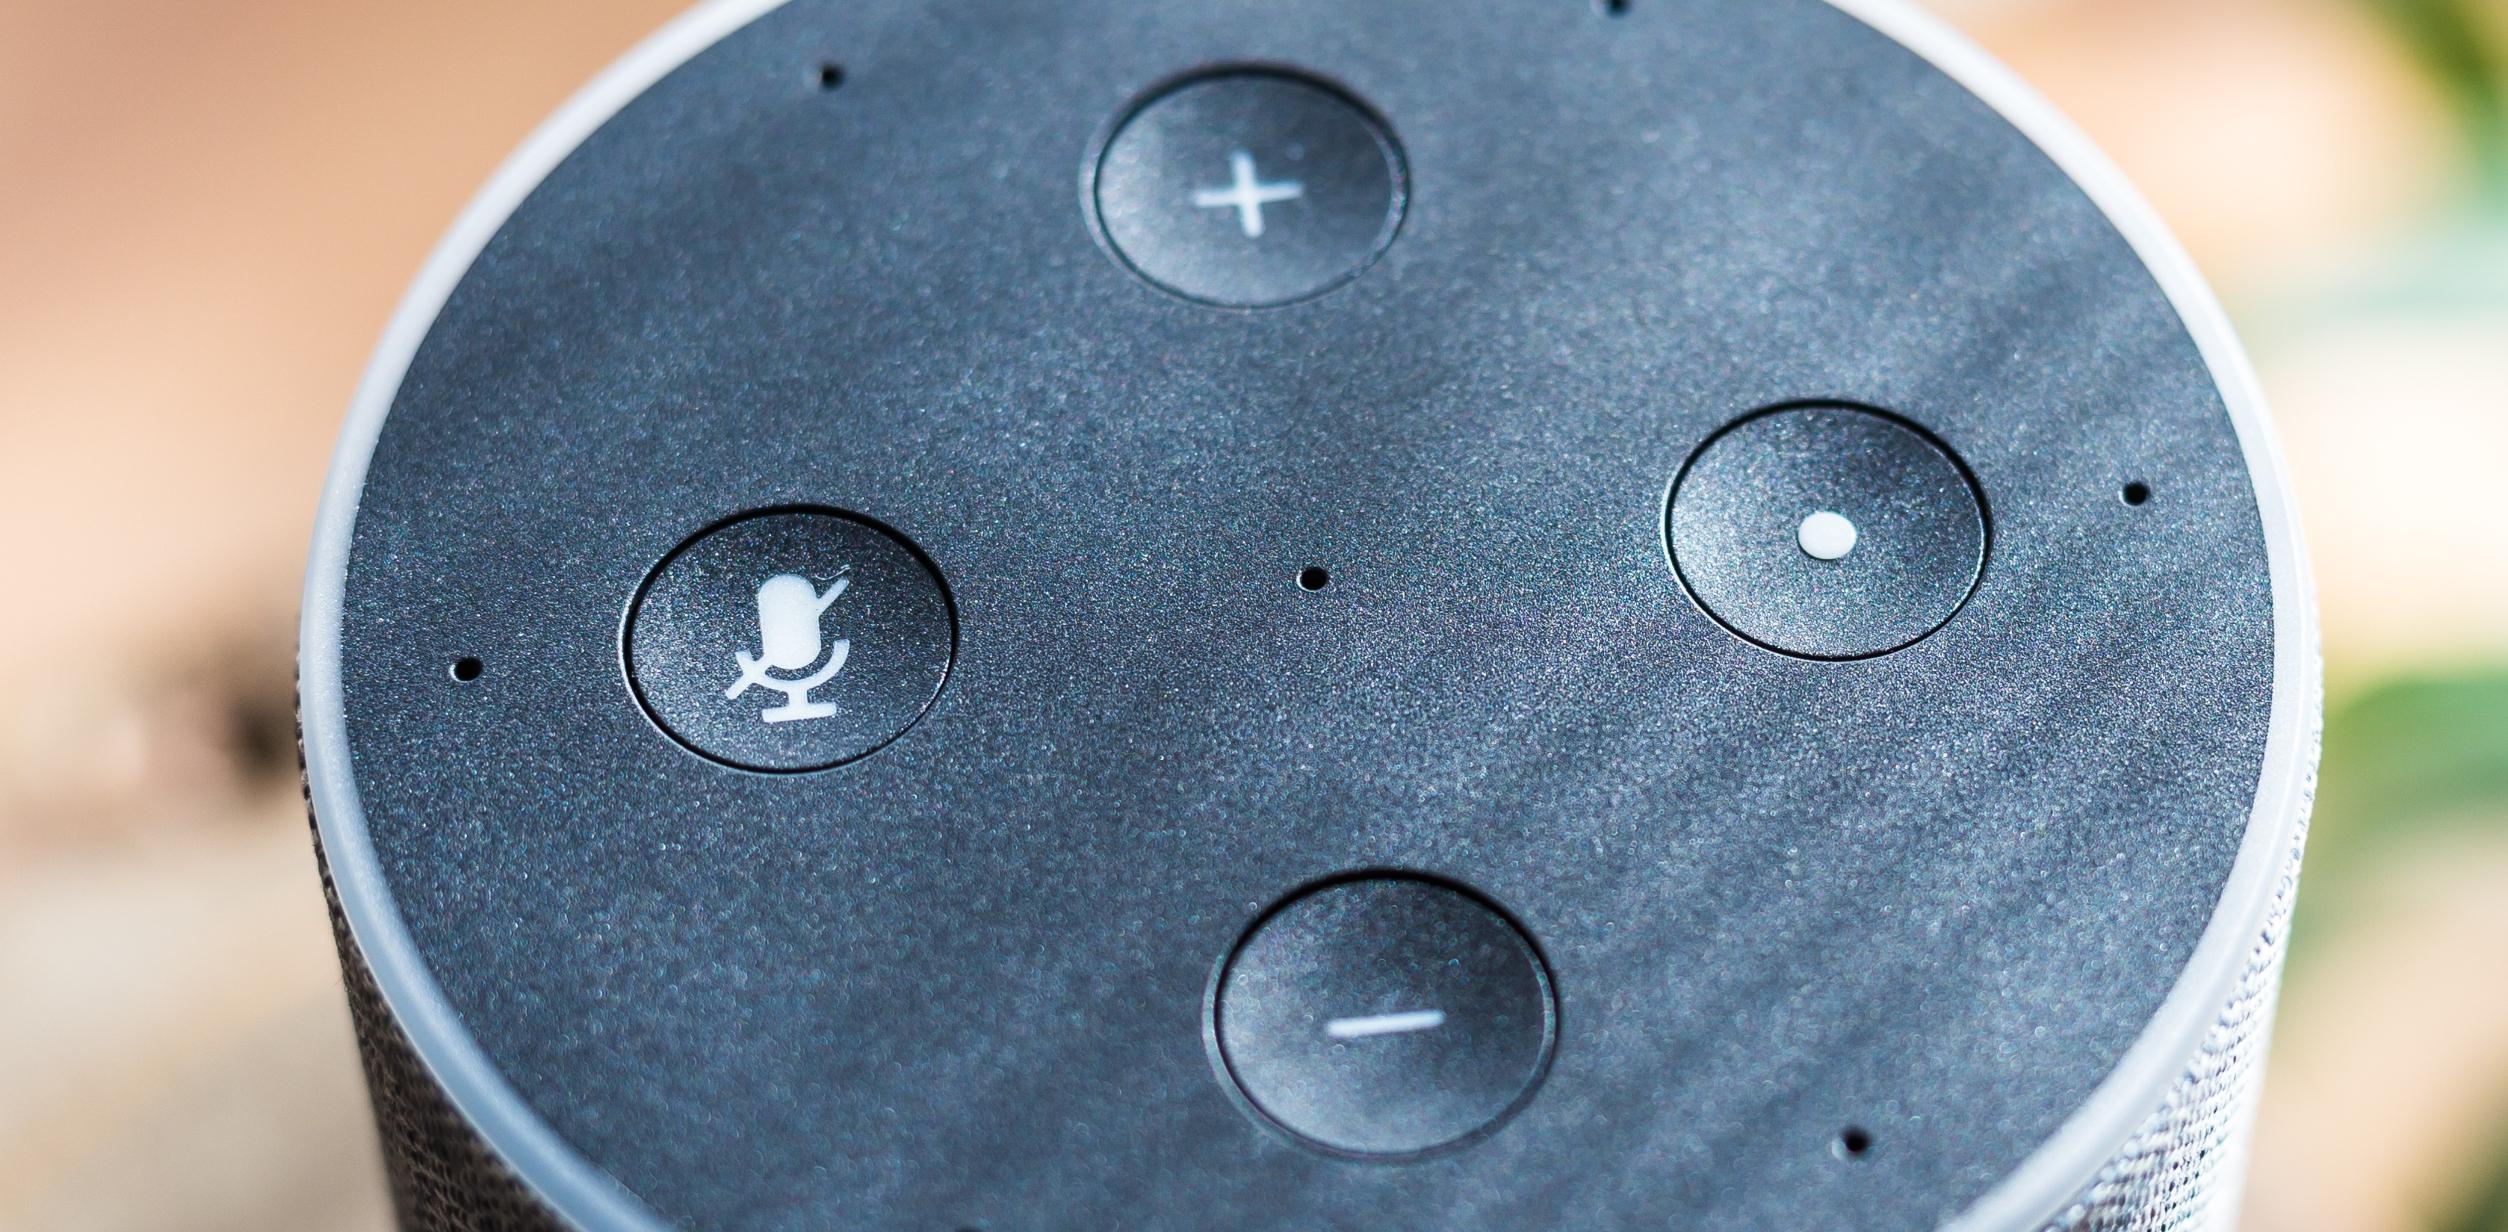 speaker buttons